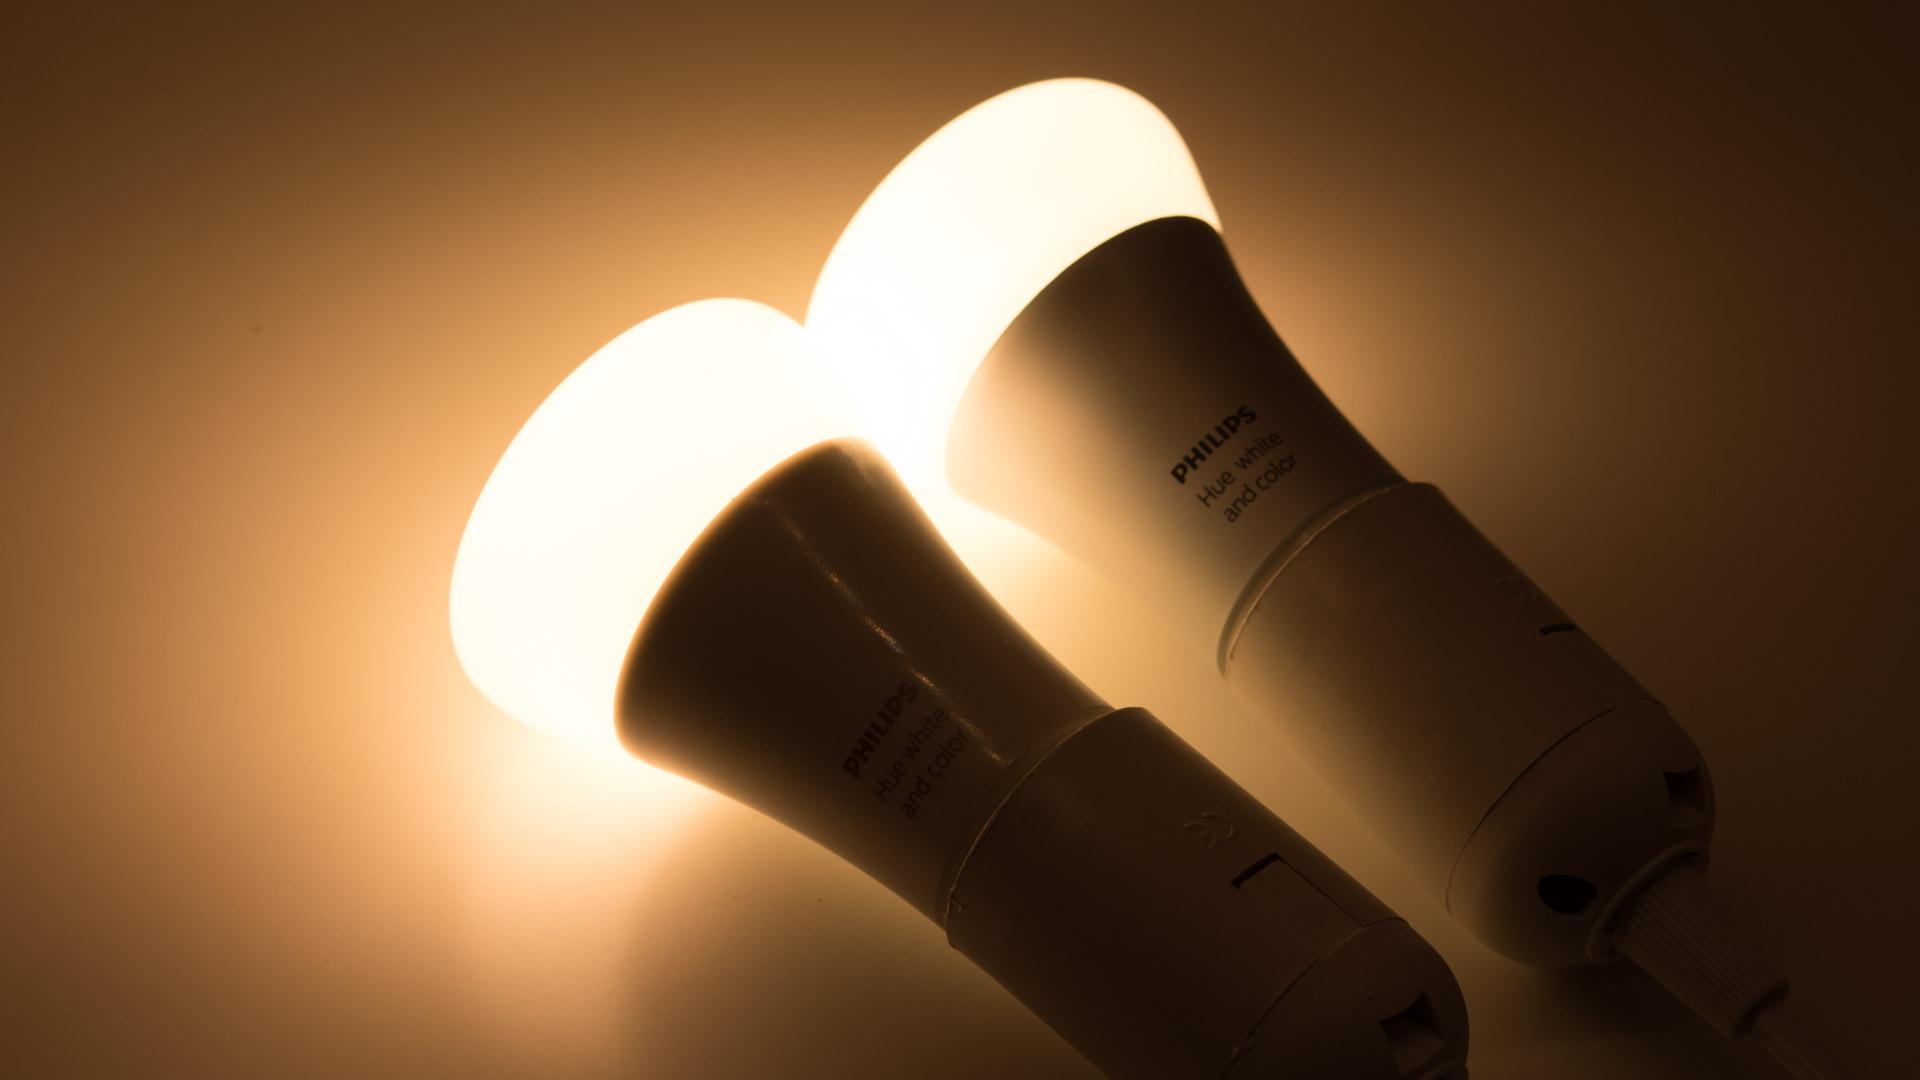 Philips hue led lampe e27 3 generation im vergleich mit der 2 fazit parisarafo Images